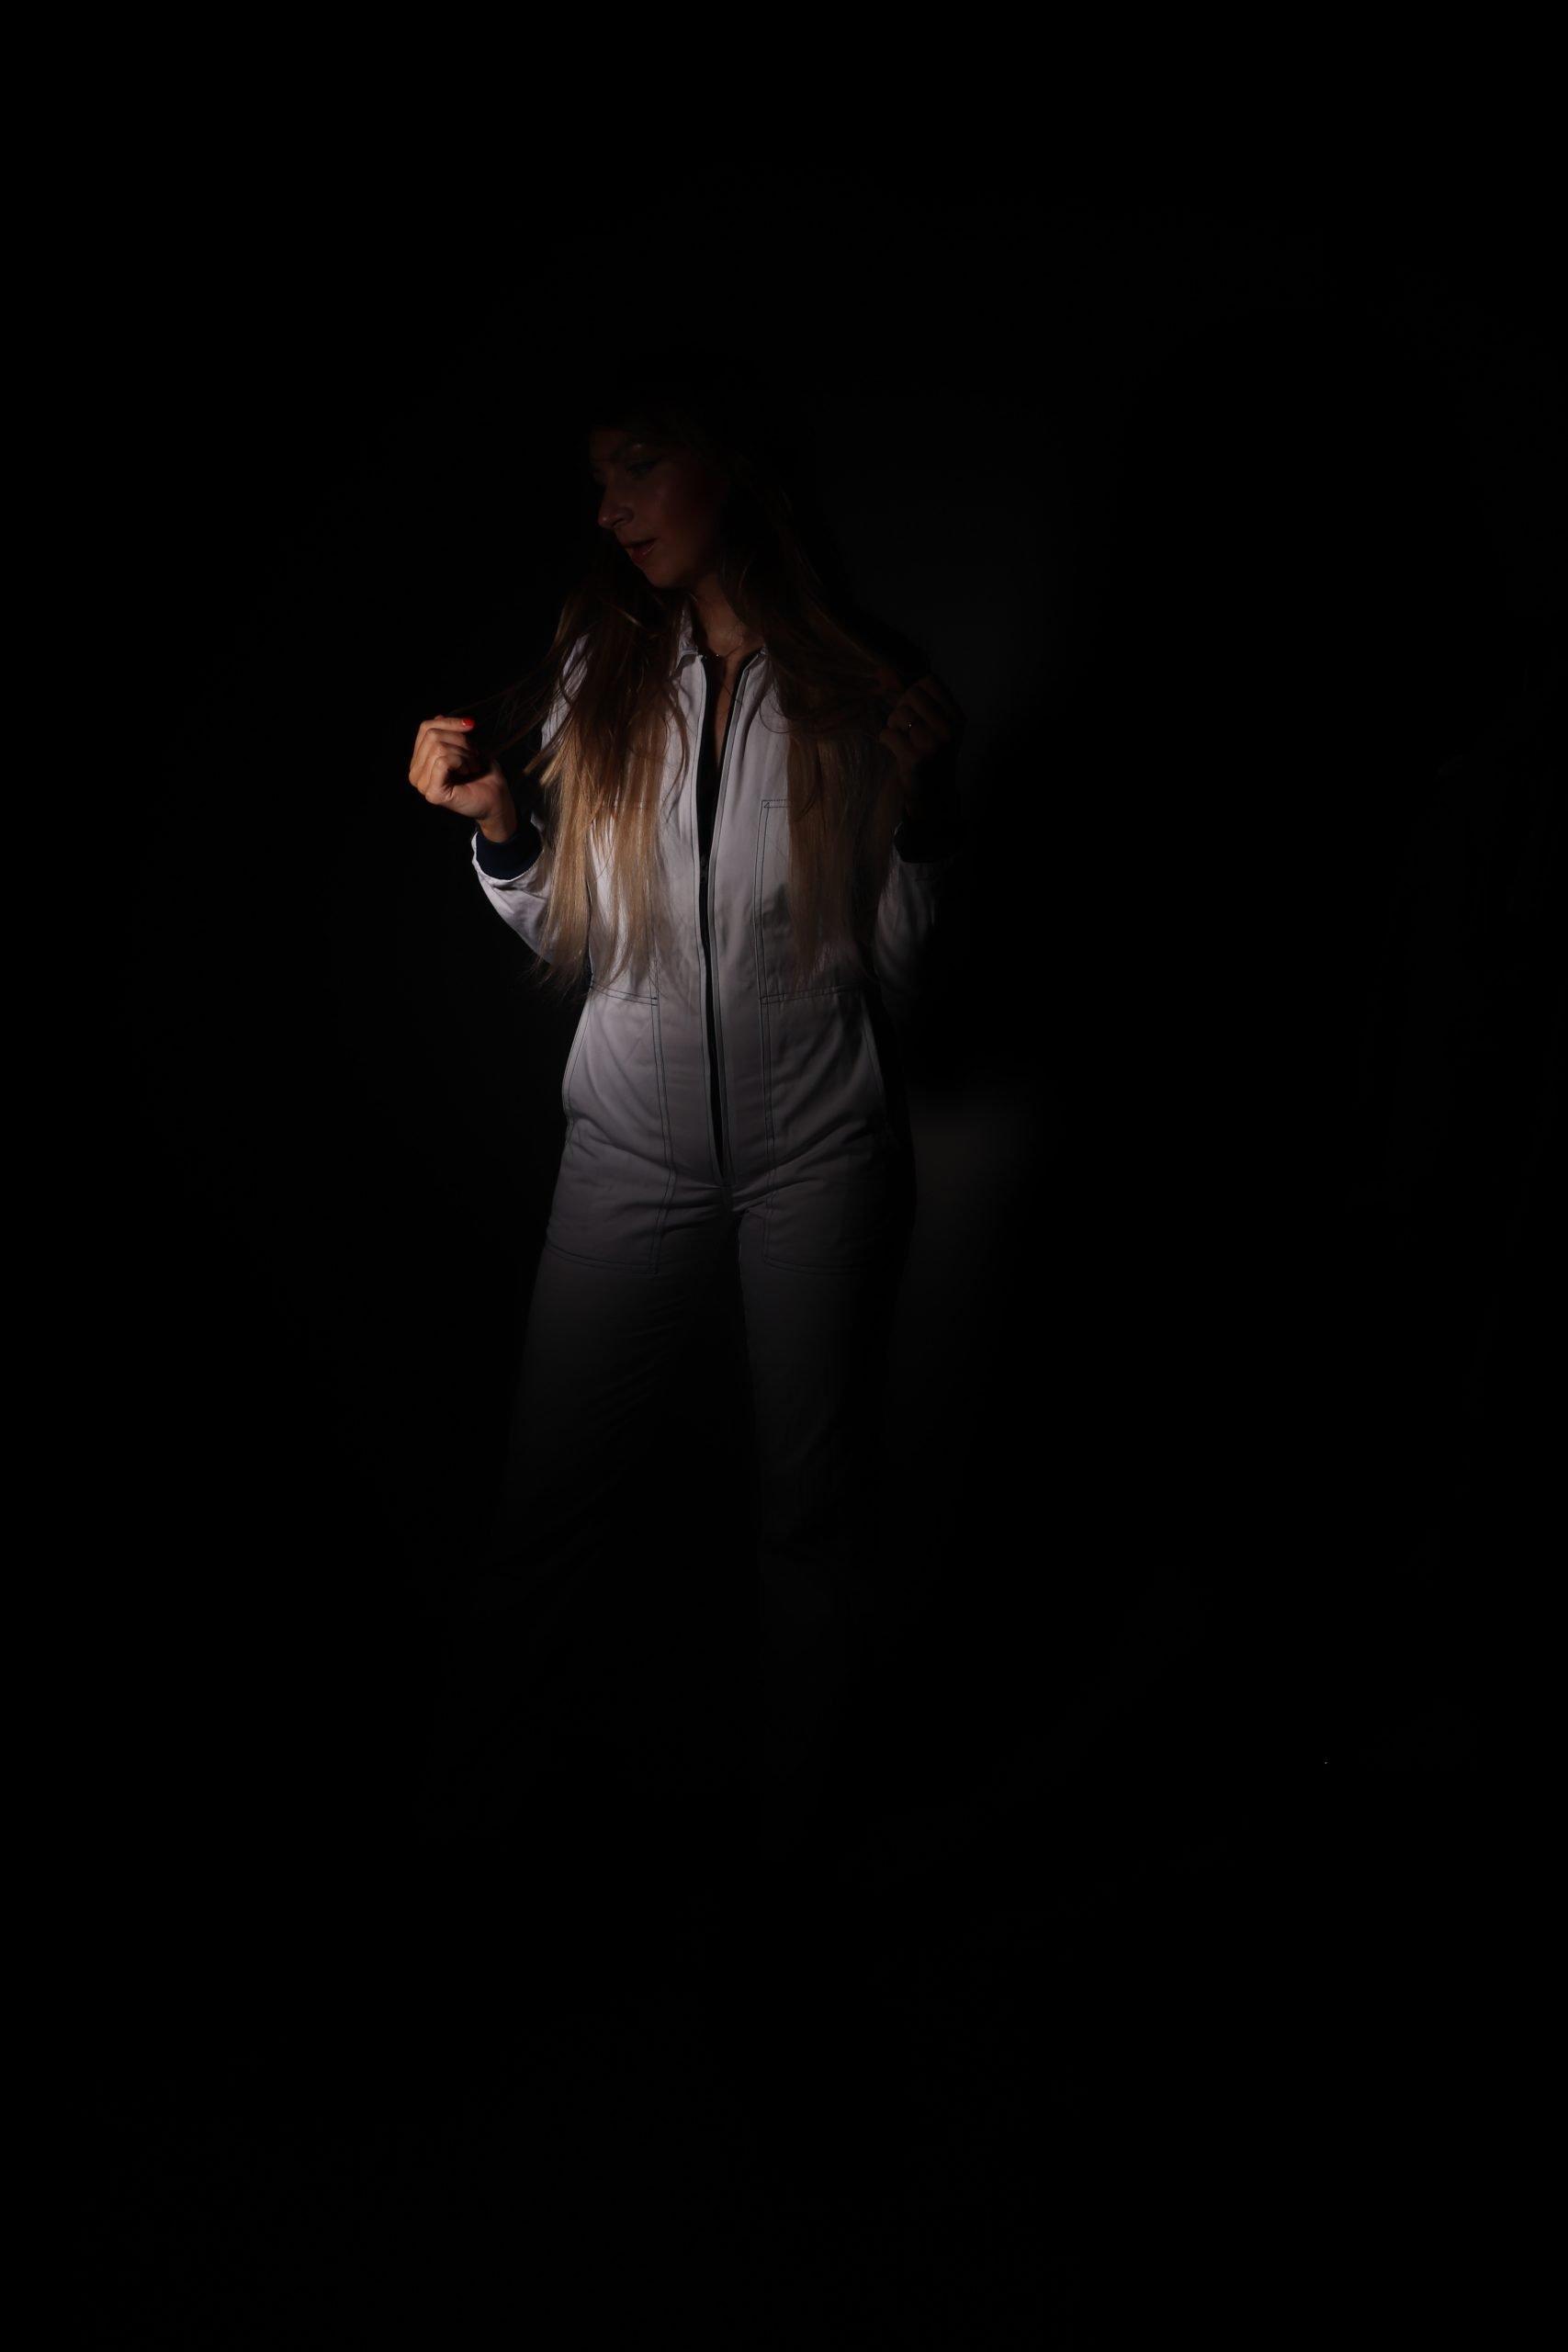 yamaha overall workwear white jumpsuit dark photo studio fotostudio